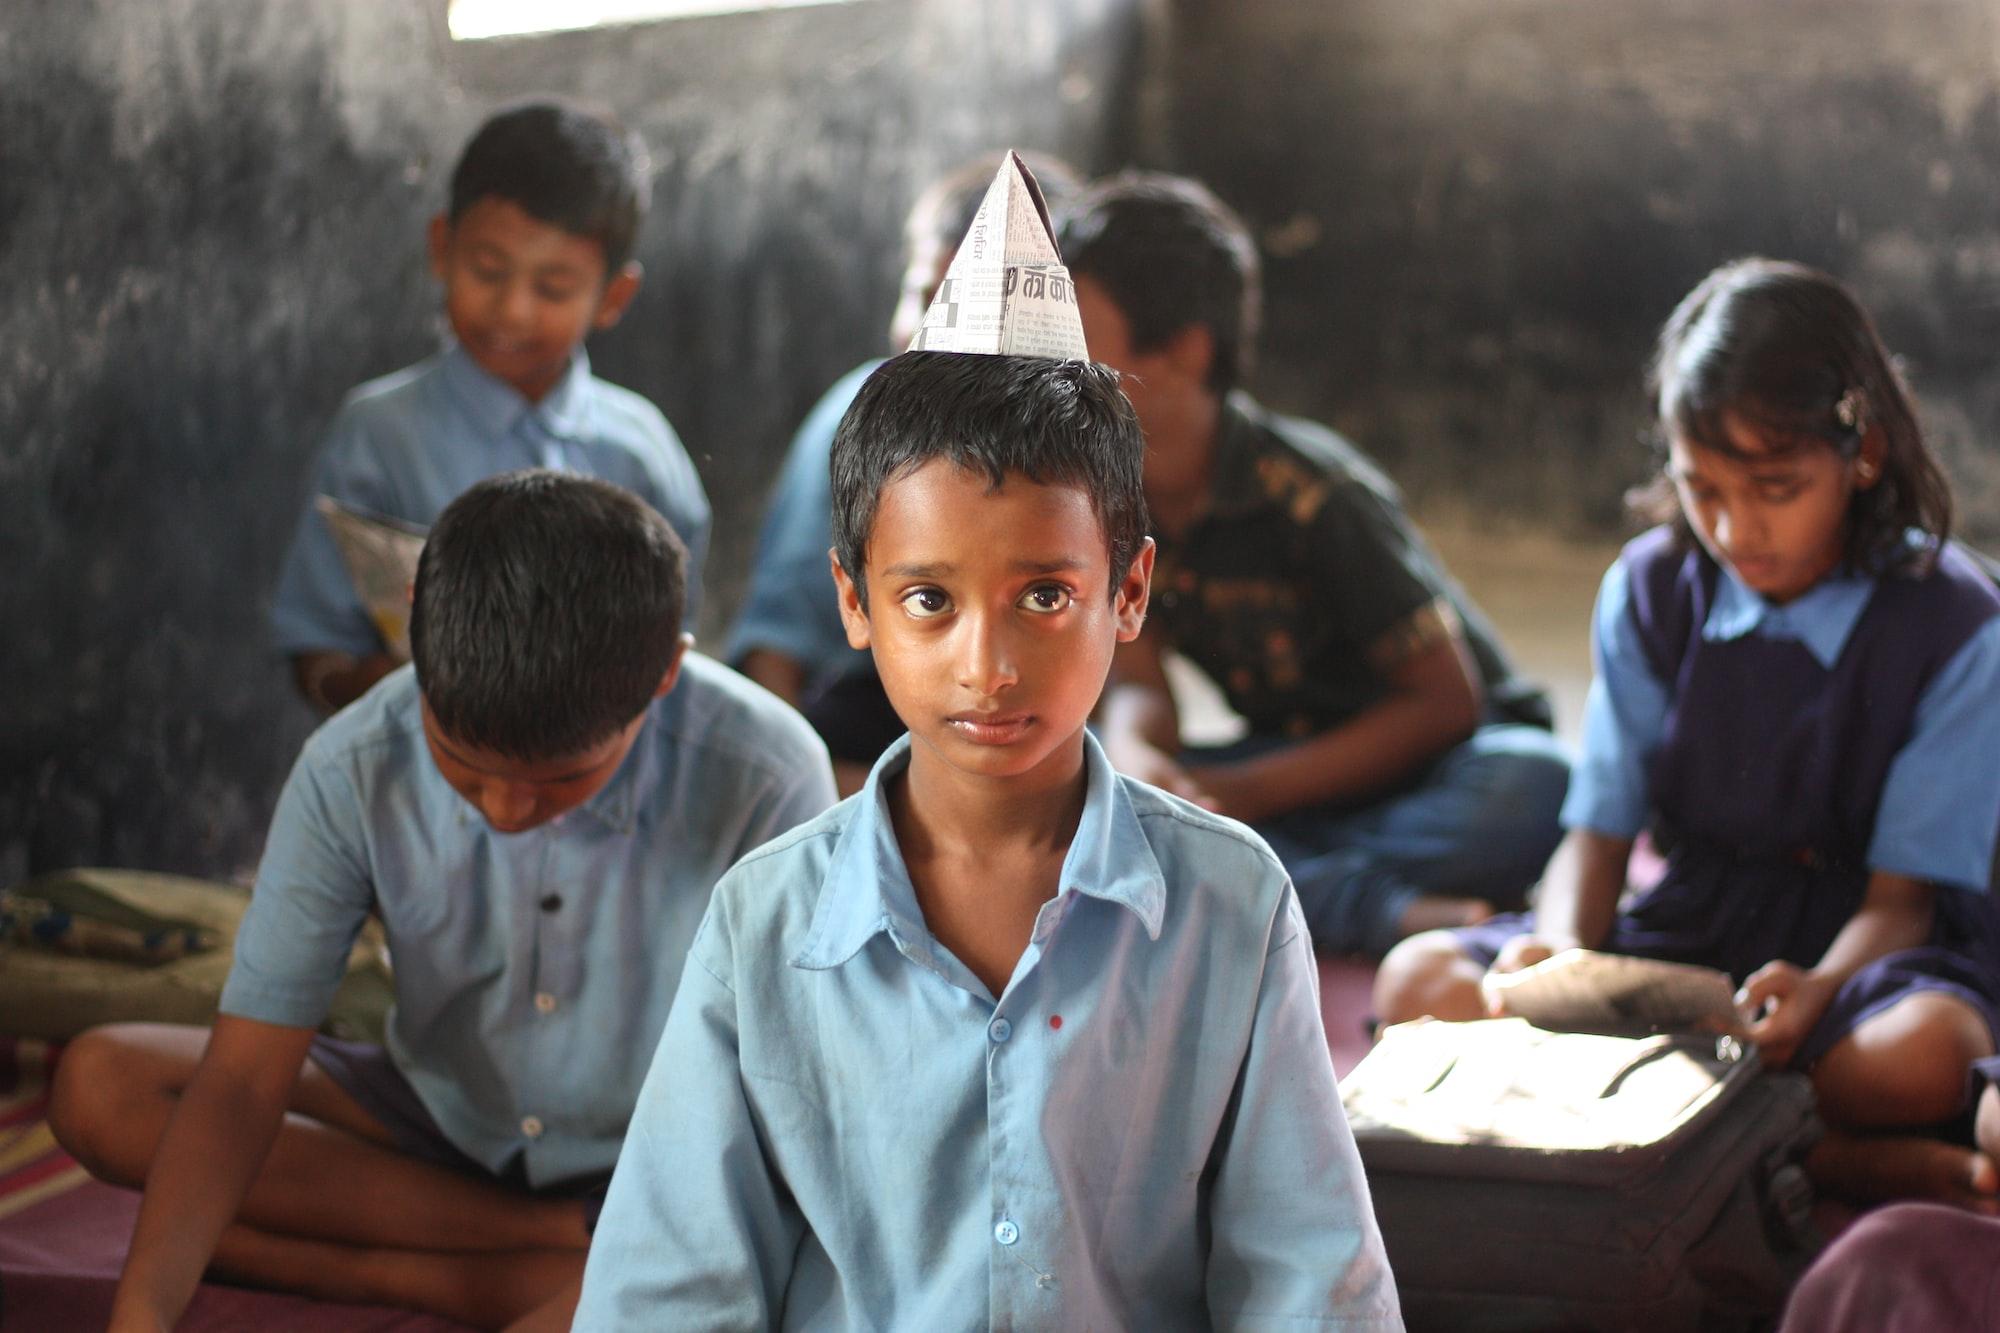 Serious Indian School Kid